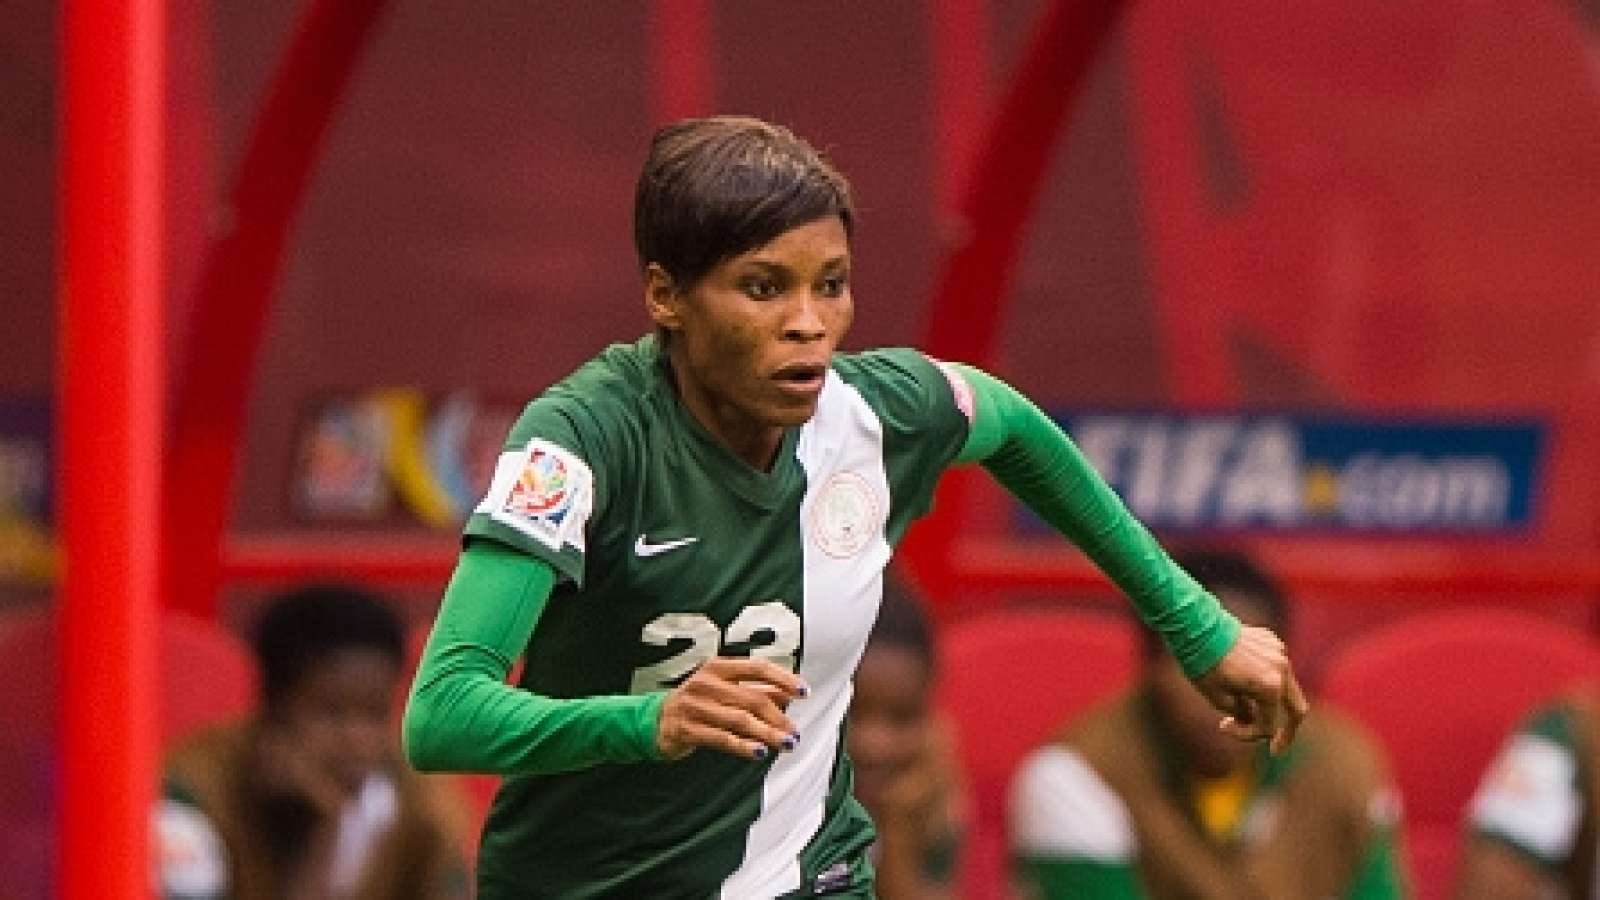 Super Falcons star Ngozi Ebere joins Norwegian club Arna Bjomar